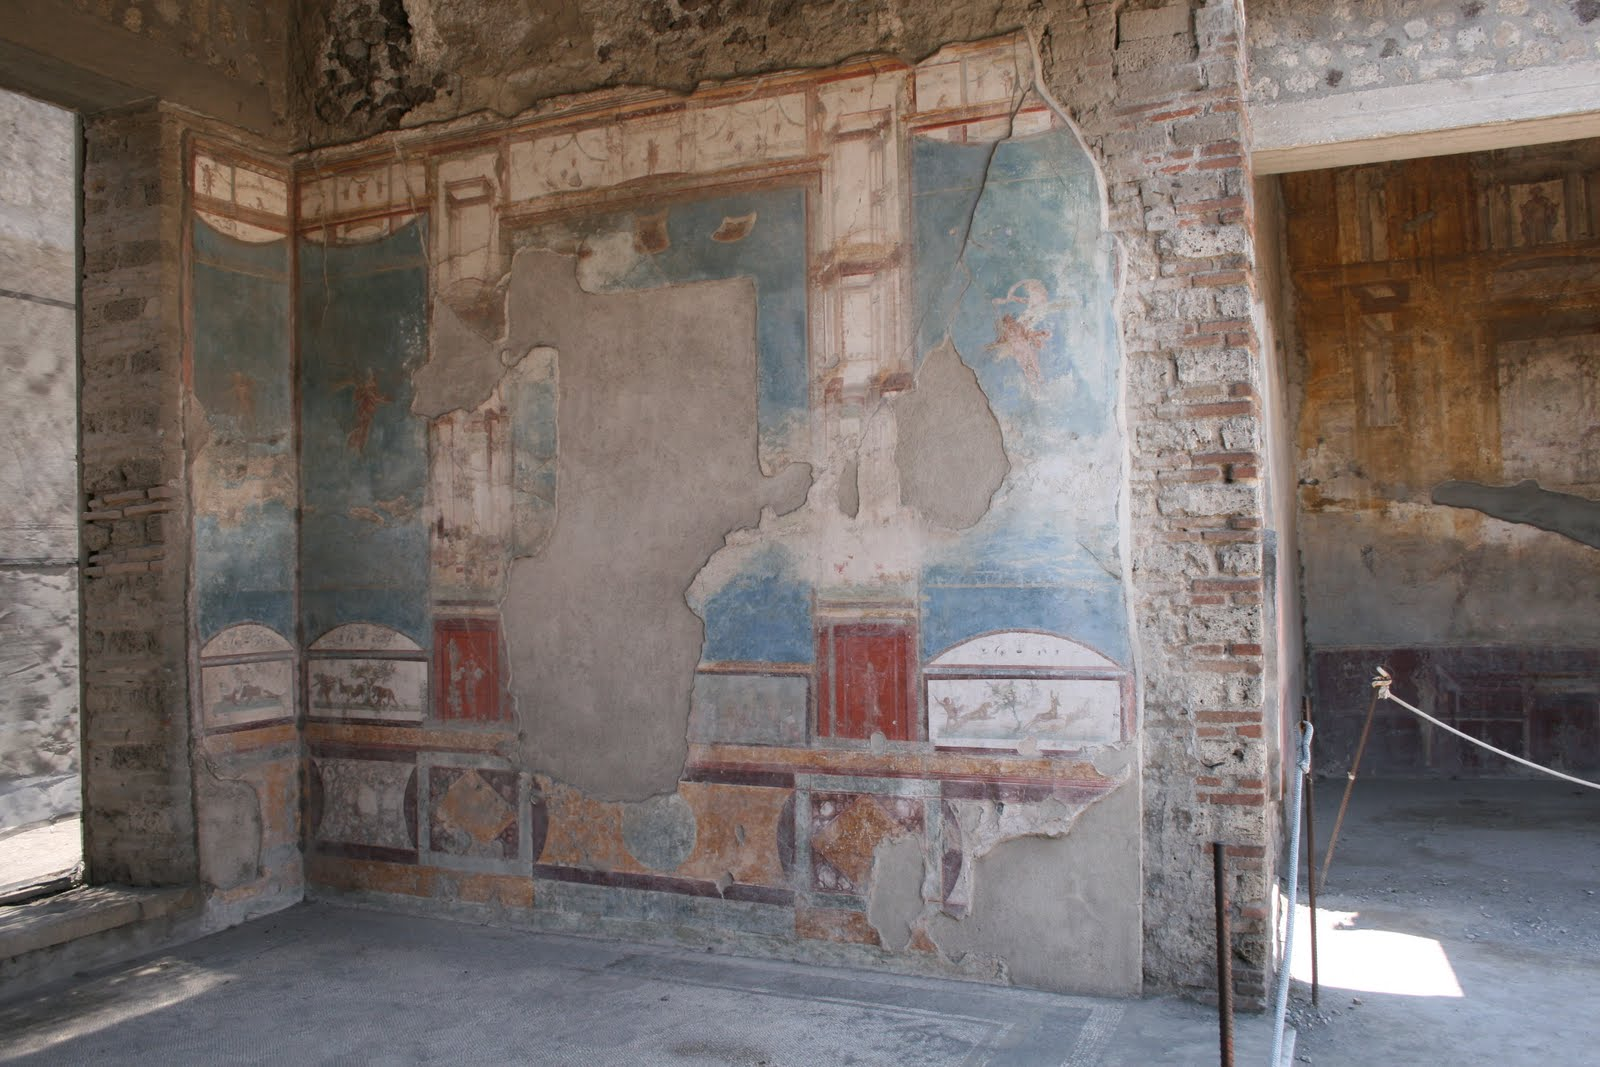 Domvs romana tablinum recibir y trabajar en la casa romana - La casa romana ...